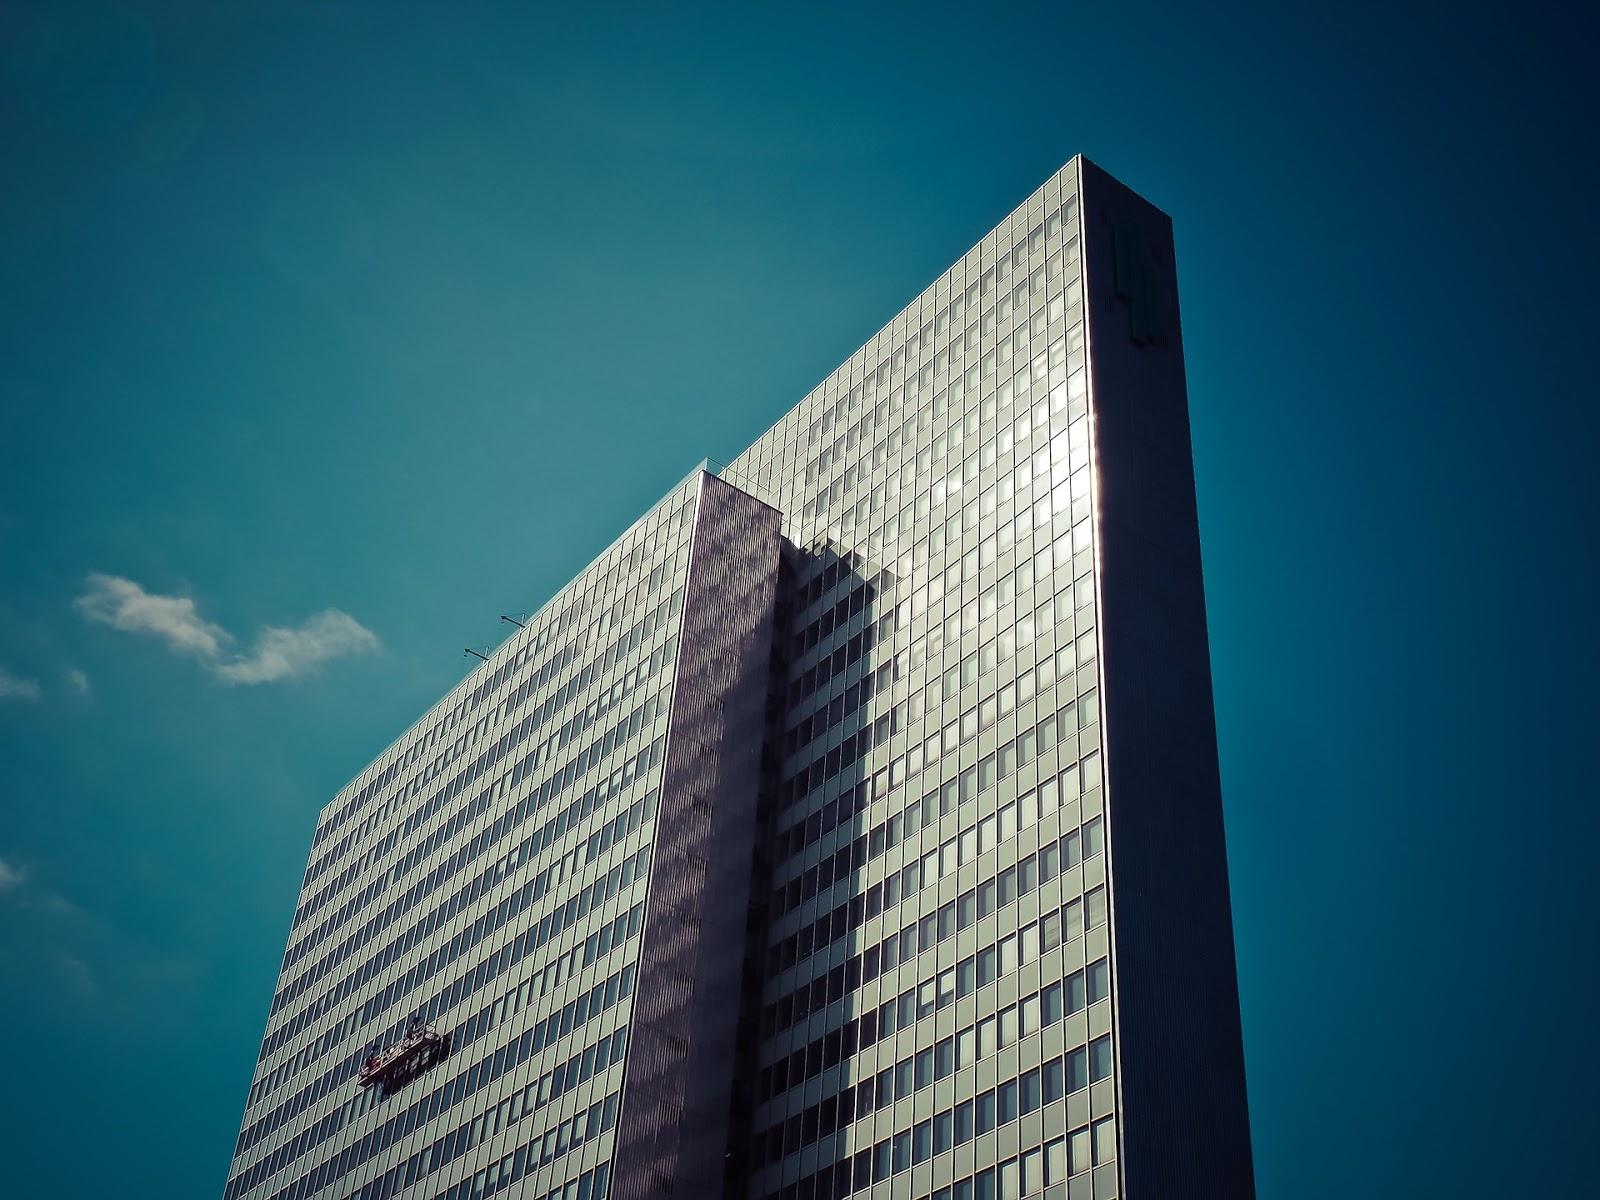 Skyscraper Photo by Micheal Gaida